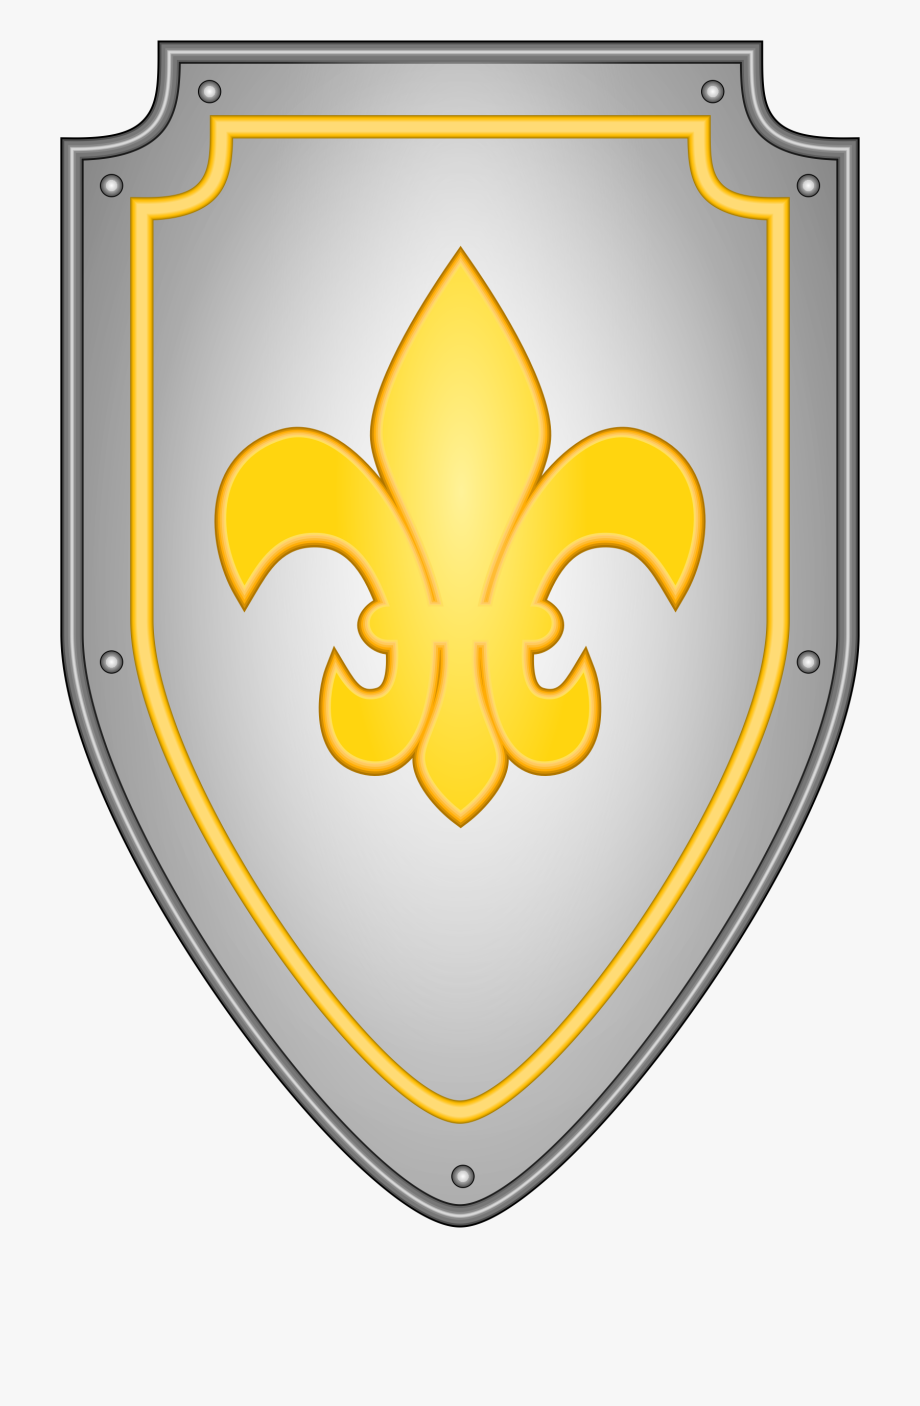 Knights clipart sheild. Shield knight transparent cartoon